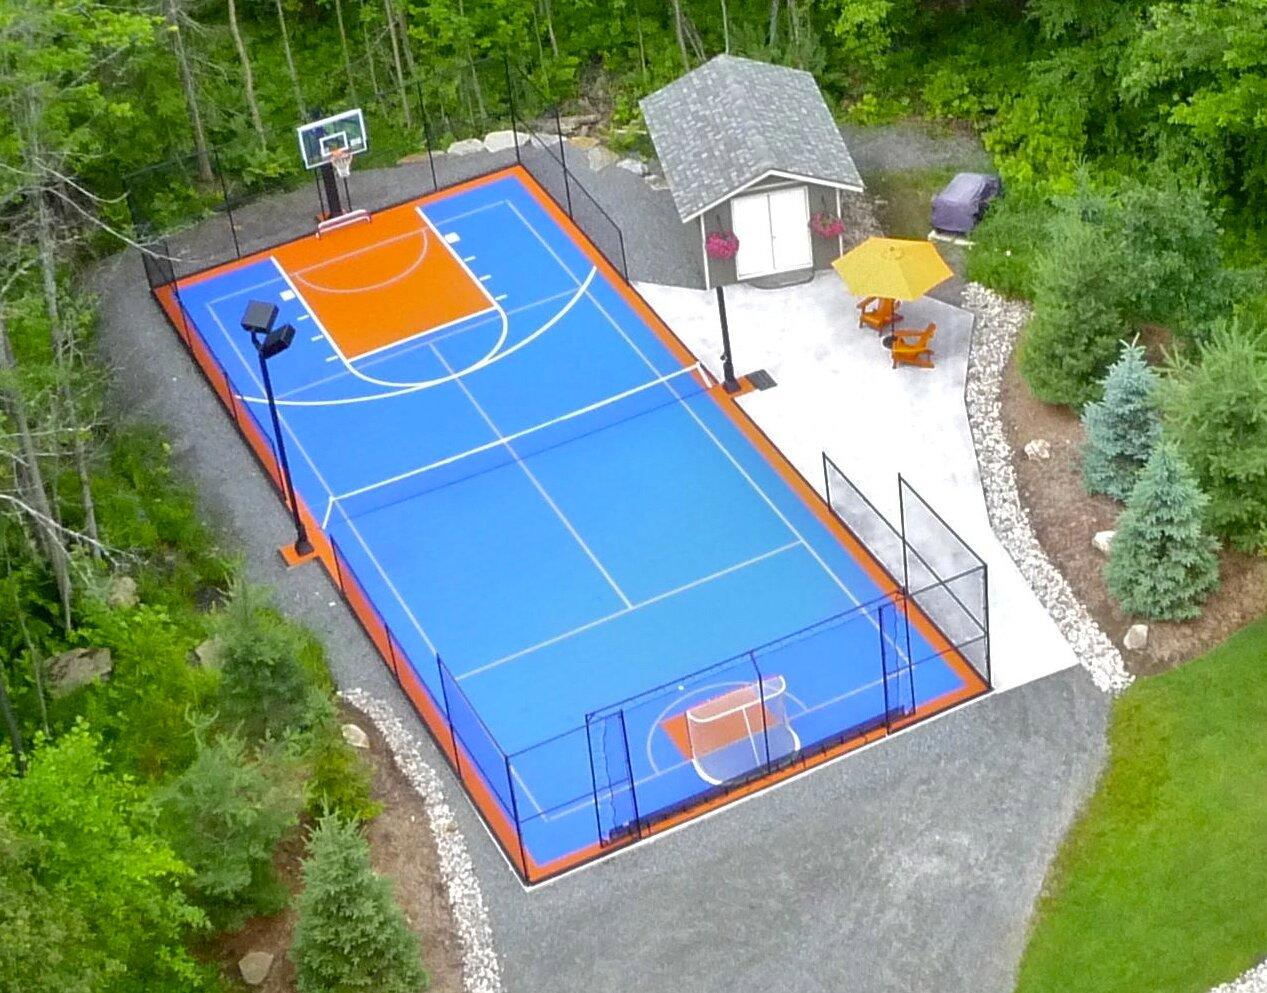 Sport court ontario sportcourt1 twitter for Sport court